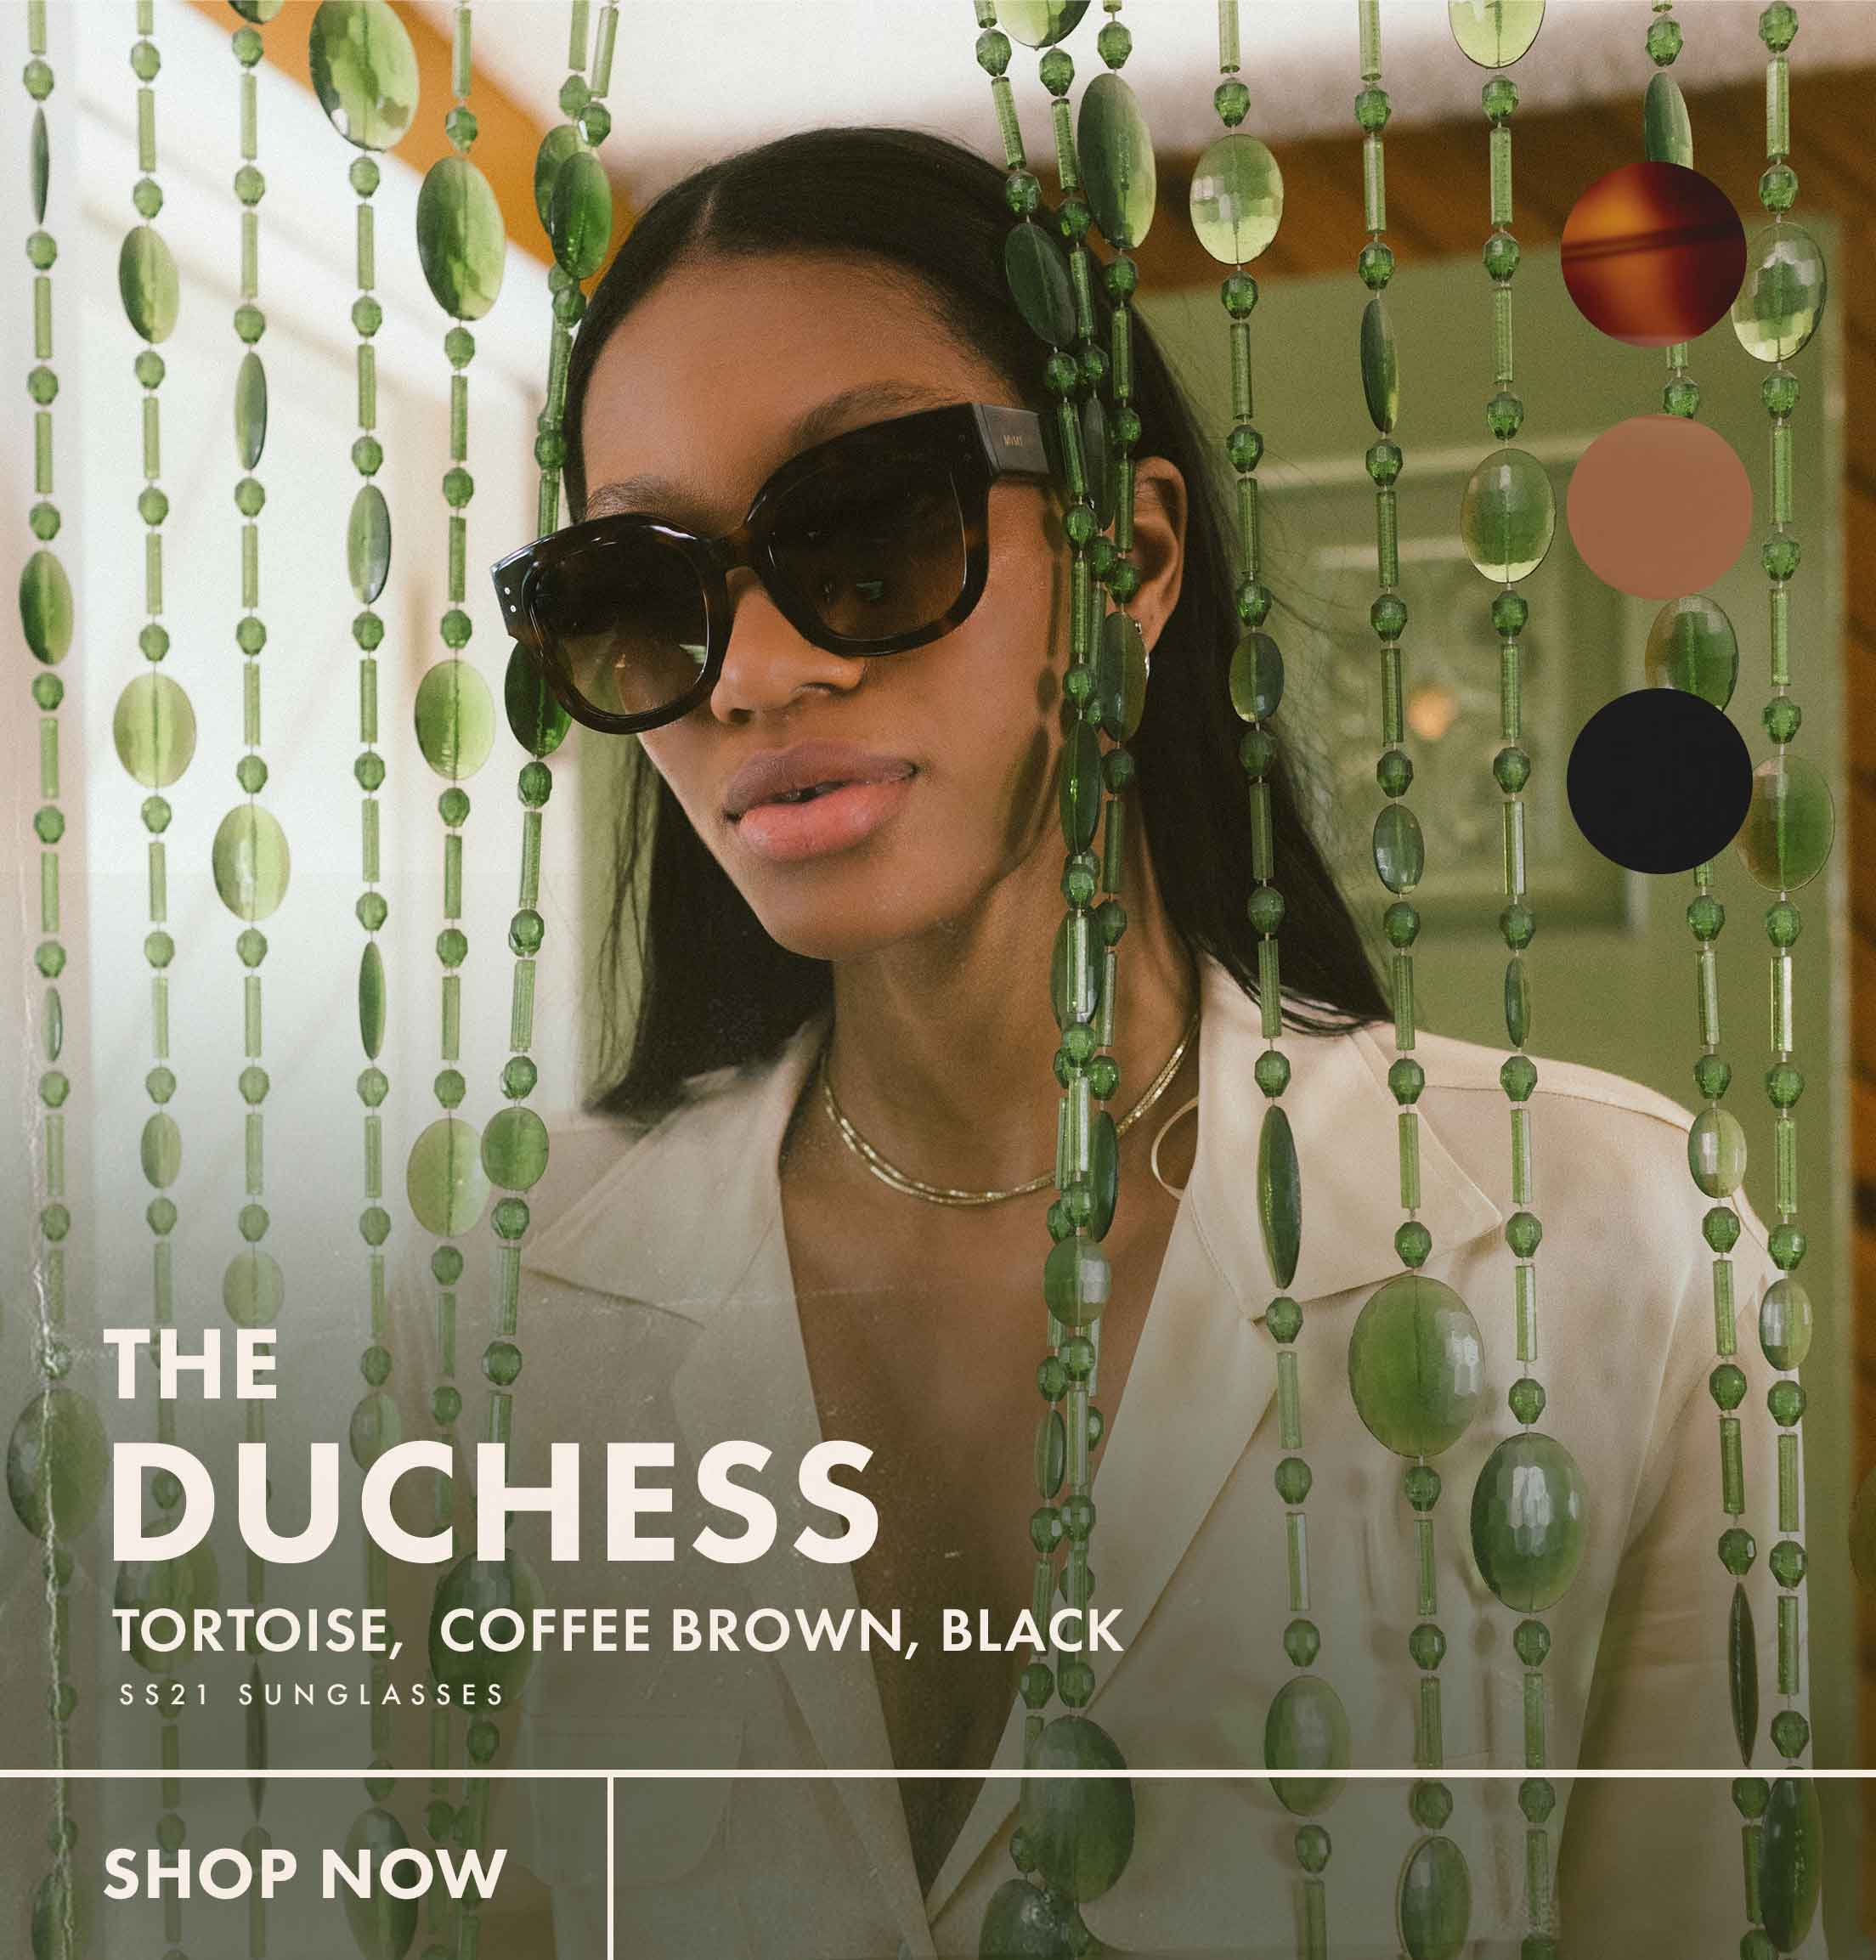 The Duchess; Tortoise, Coffee Brown, Black. SS21 Sunglasses: Shop Now